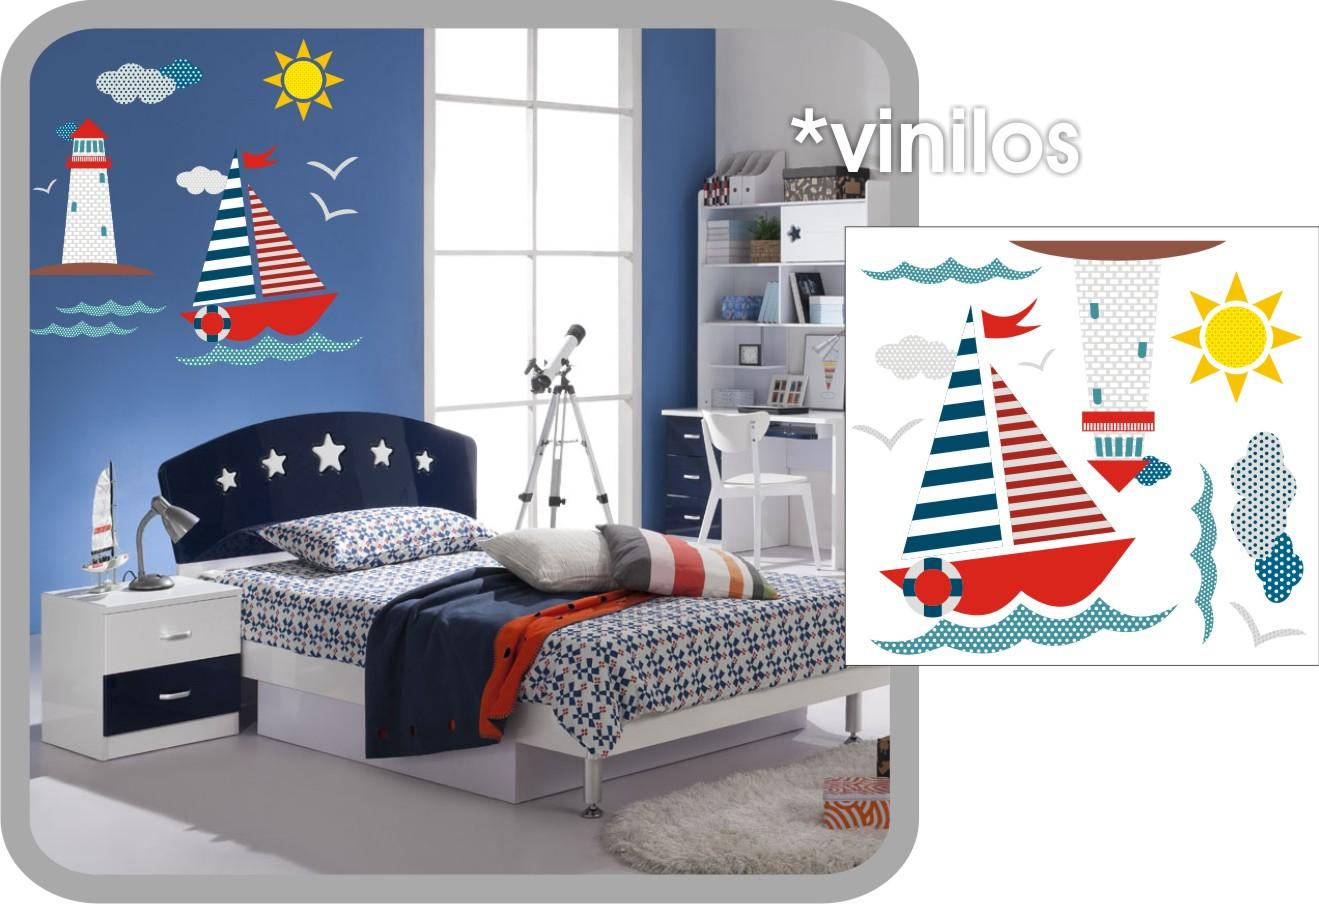 Vinilos decorativos infantiles diseniaria tienda for Vinilos muebles infantiles